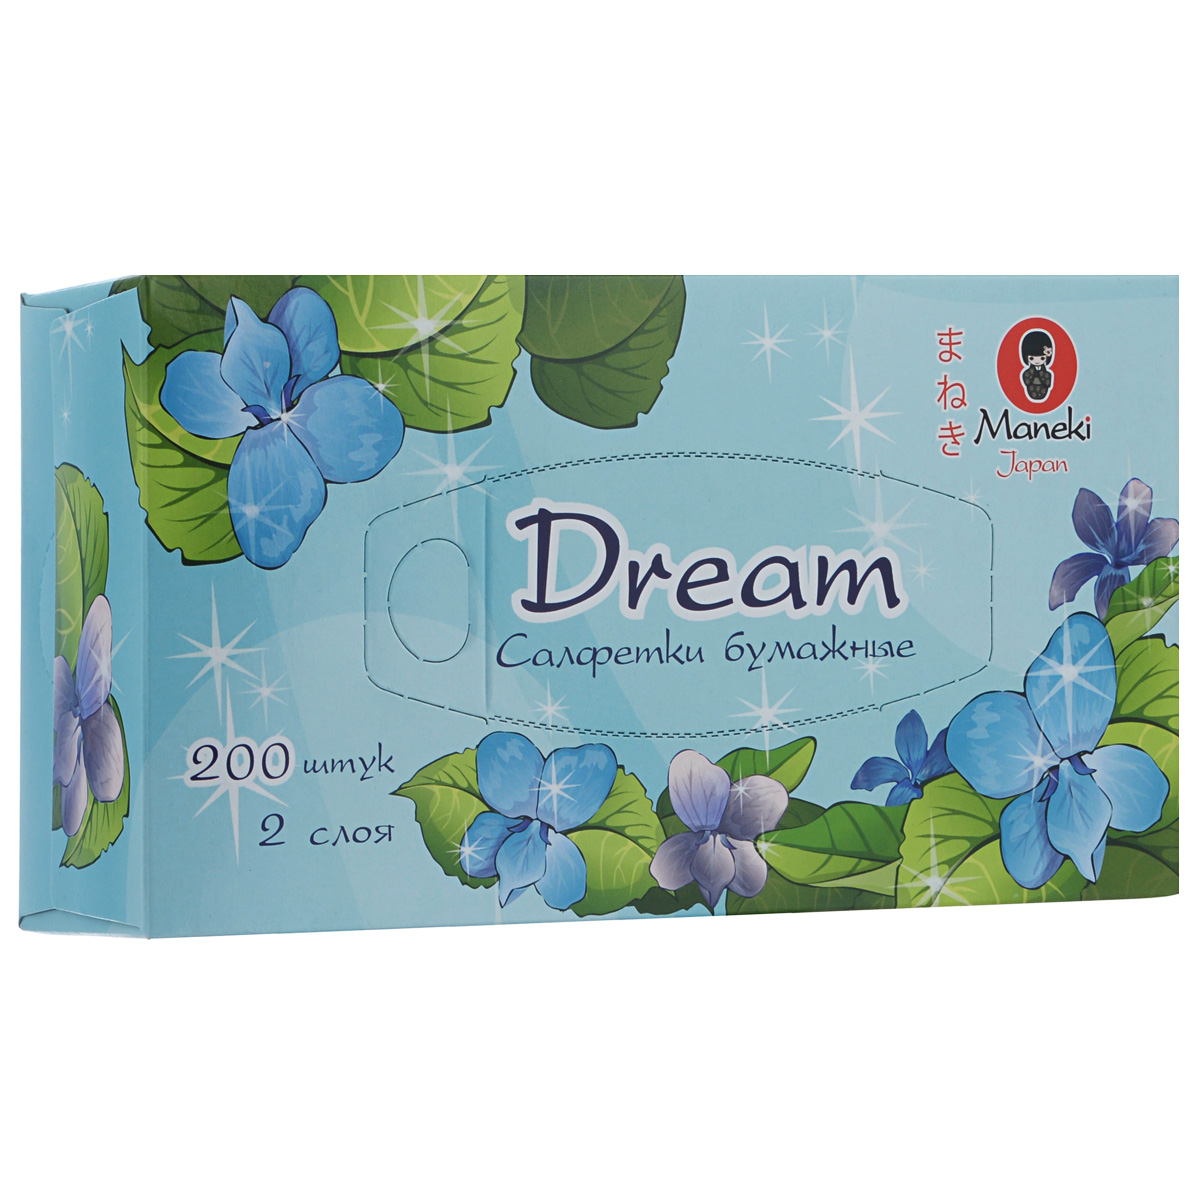 Maneki Салфетки бумажные Dream, двухслойные, цвет: голубой, 200 шт маршрутизатор zyxel p 791r v2